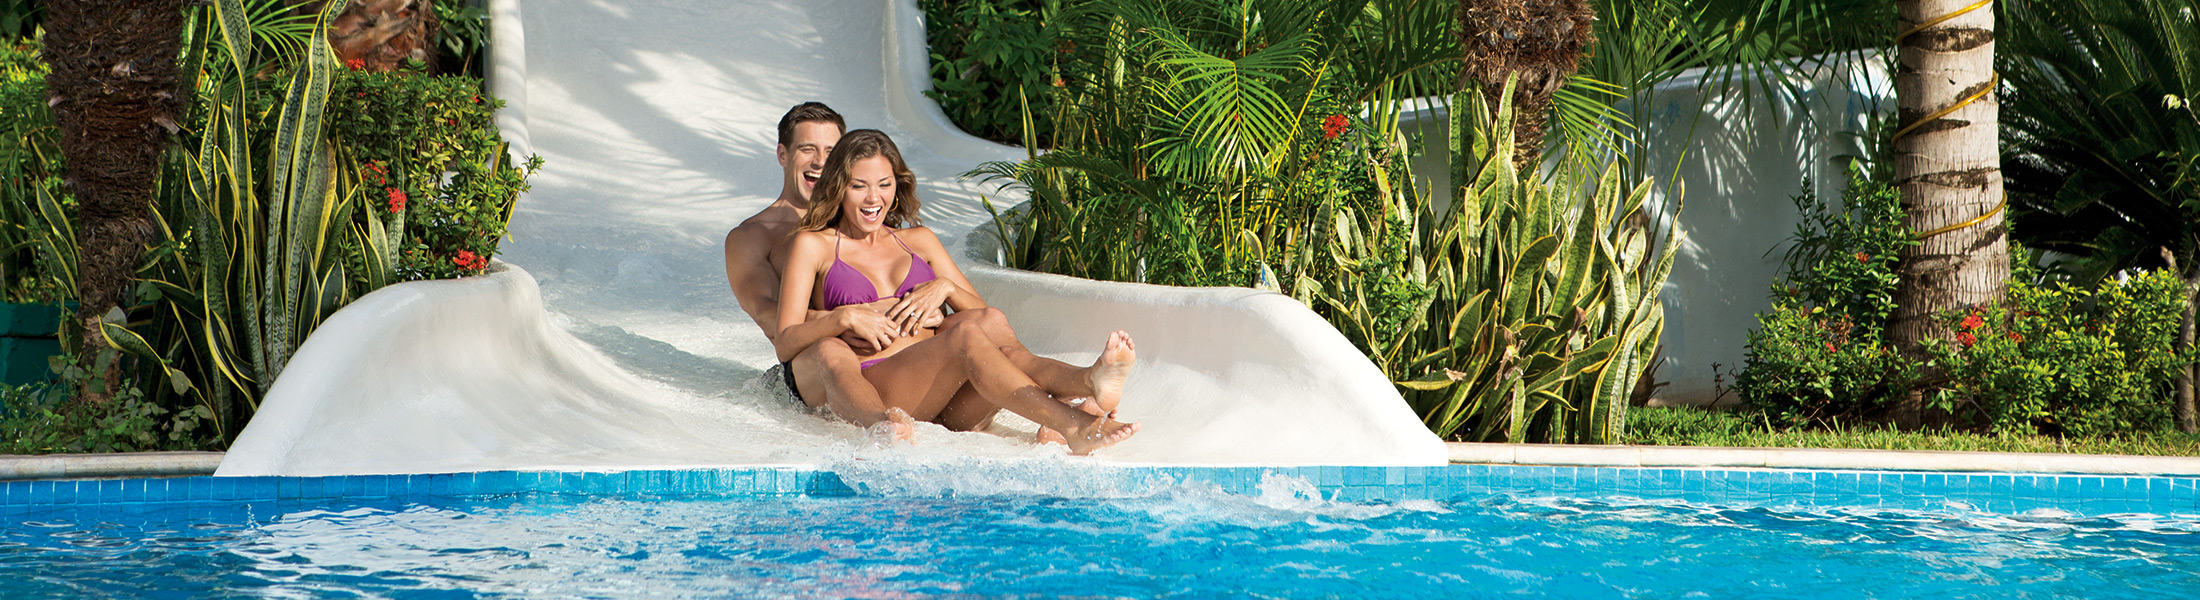 Couple sliding down a waterslide at Secrets Aura Cozumel